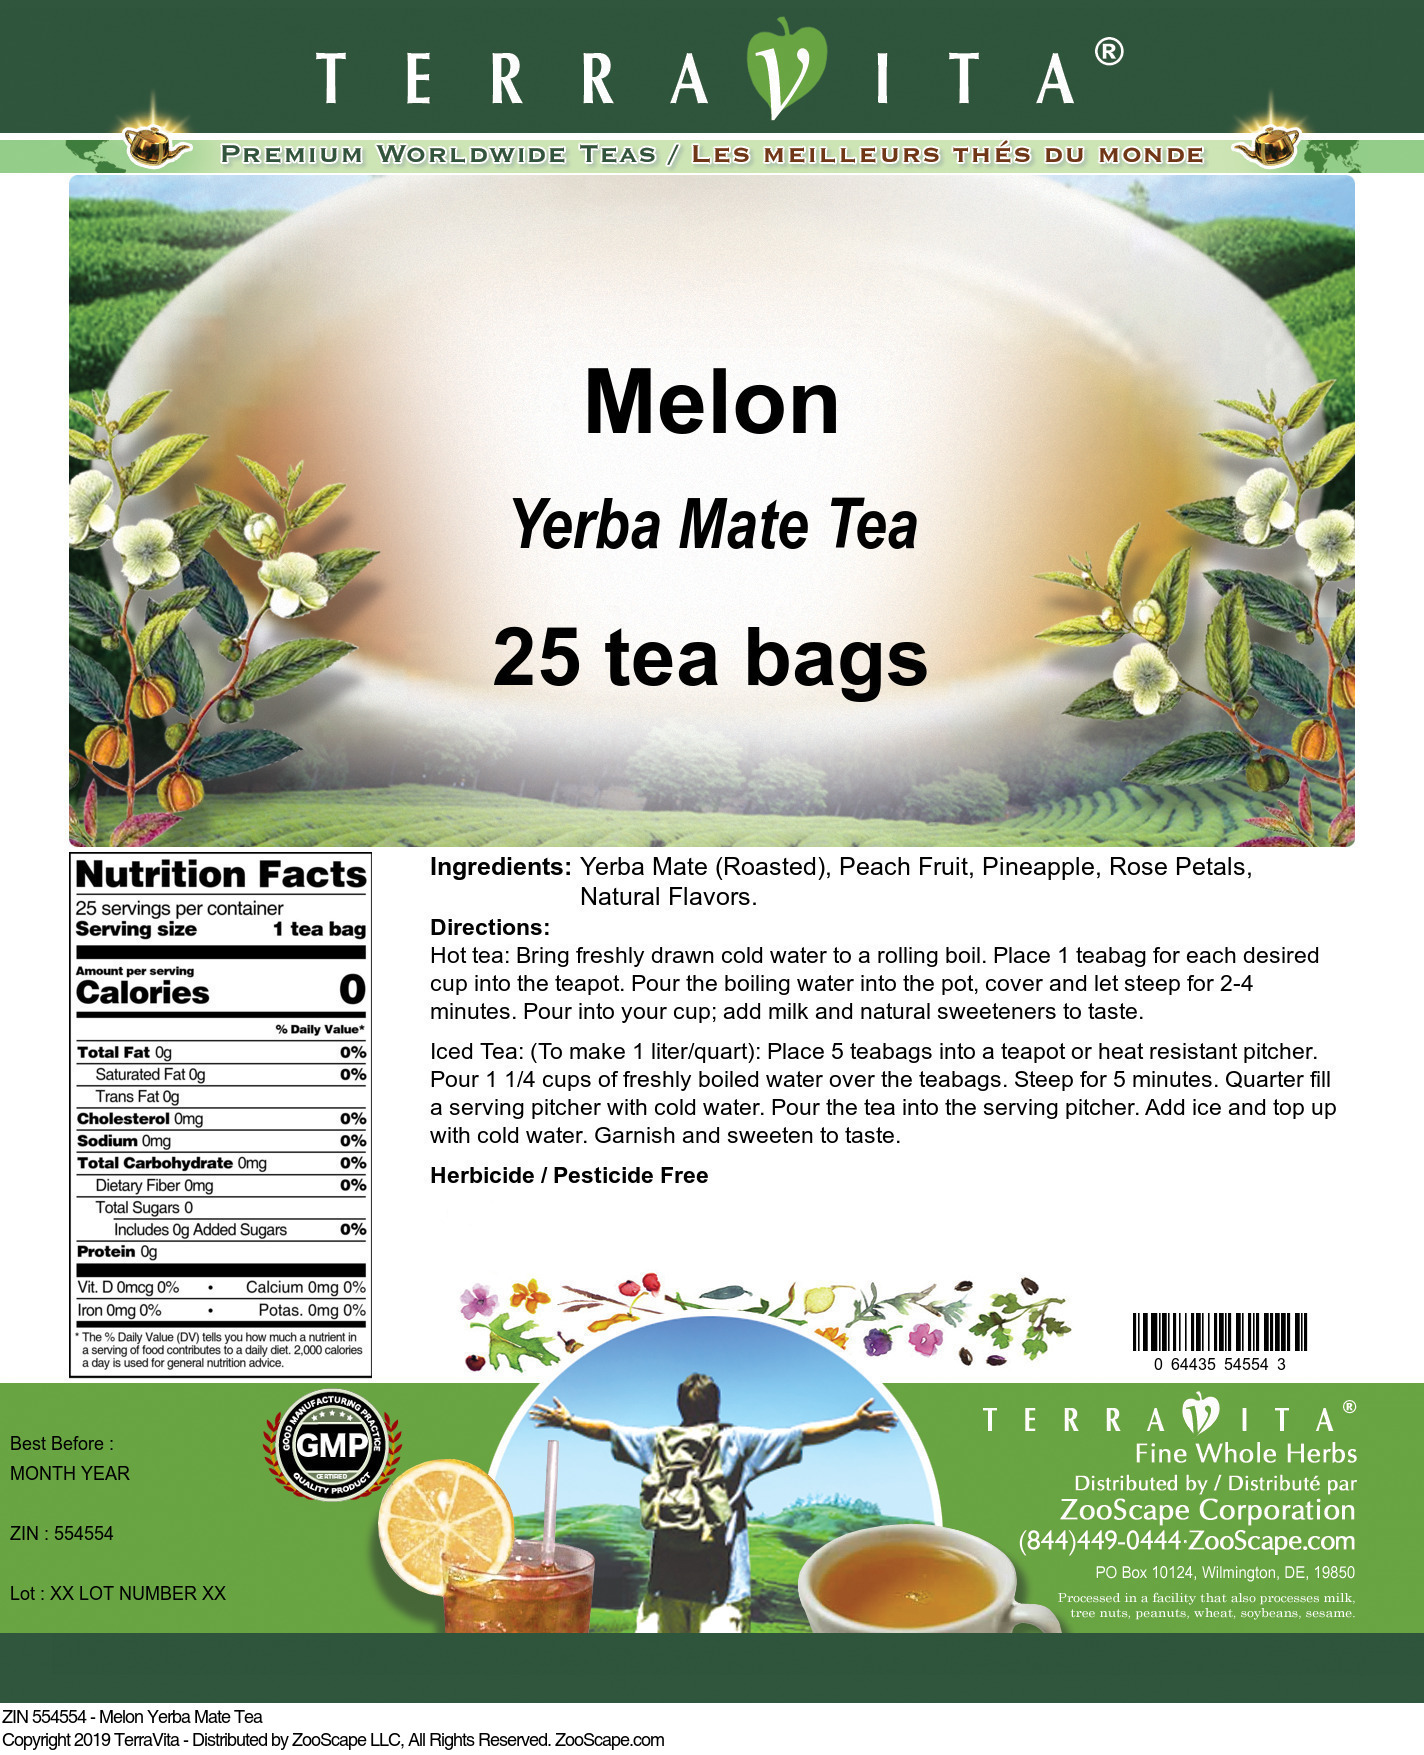 Melon Yerba Mate Tea